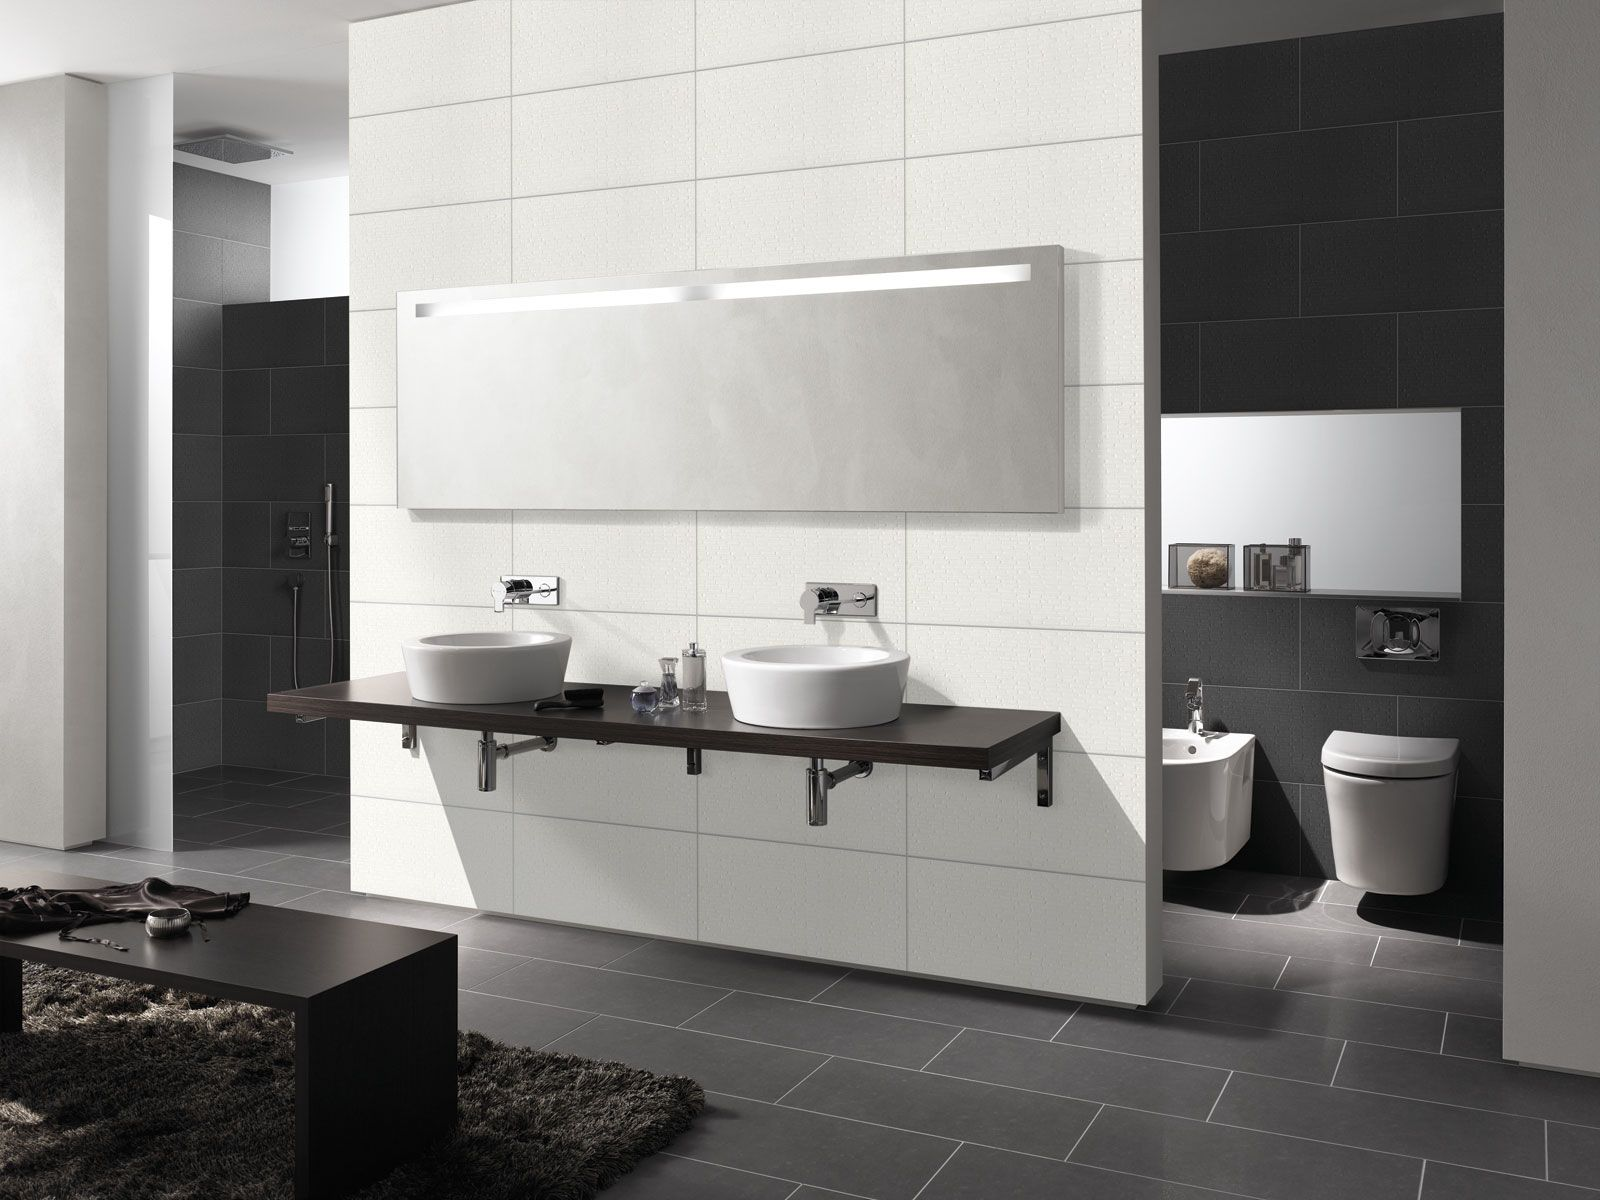 Carrelage salle de bains grès cérame Largo  Espace Aubade